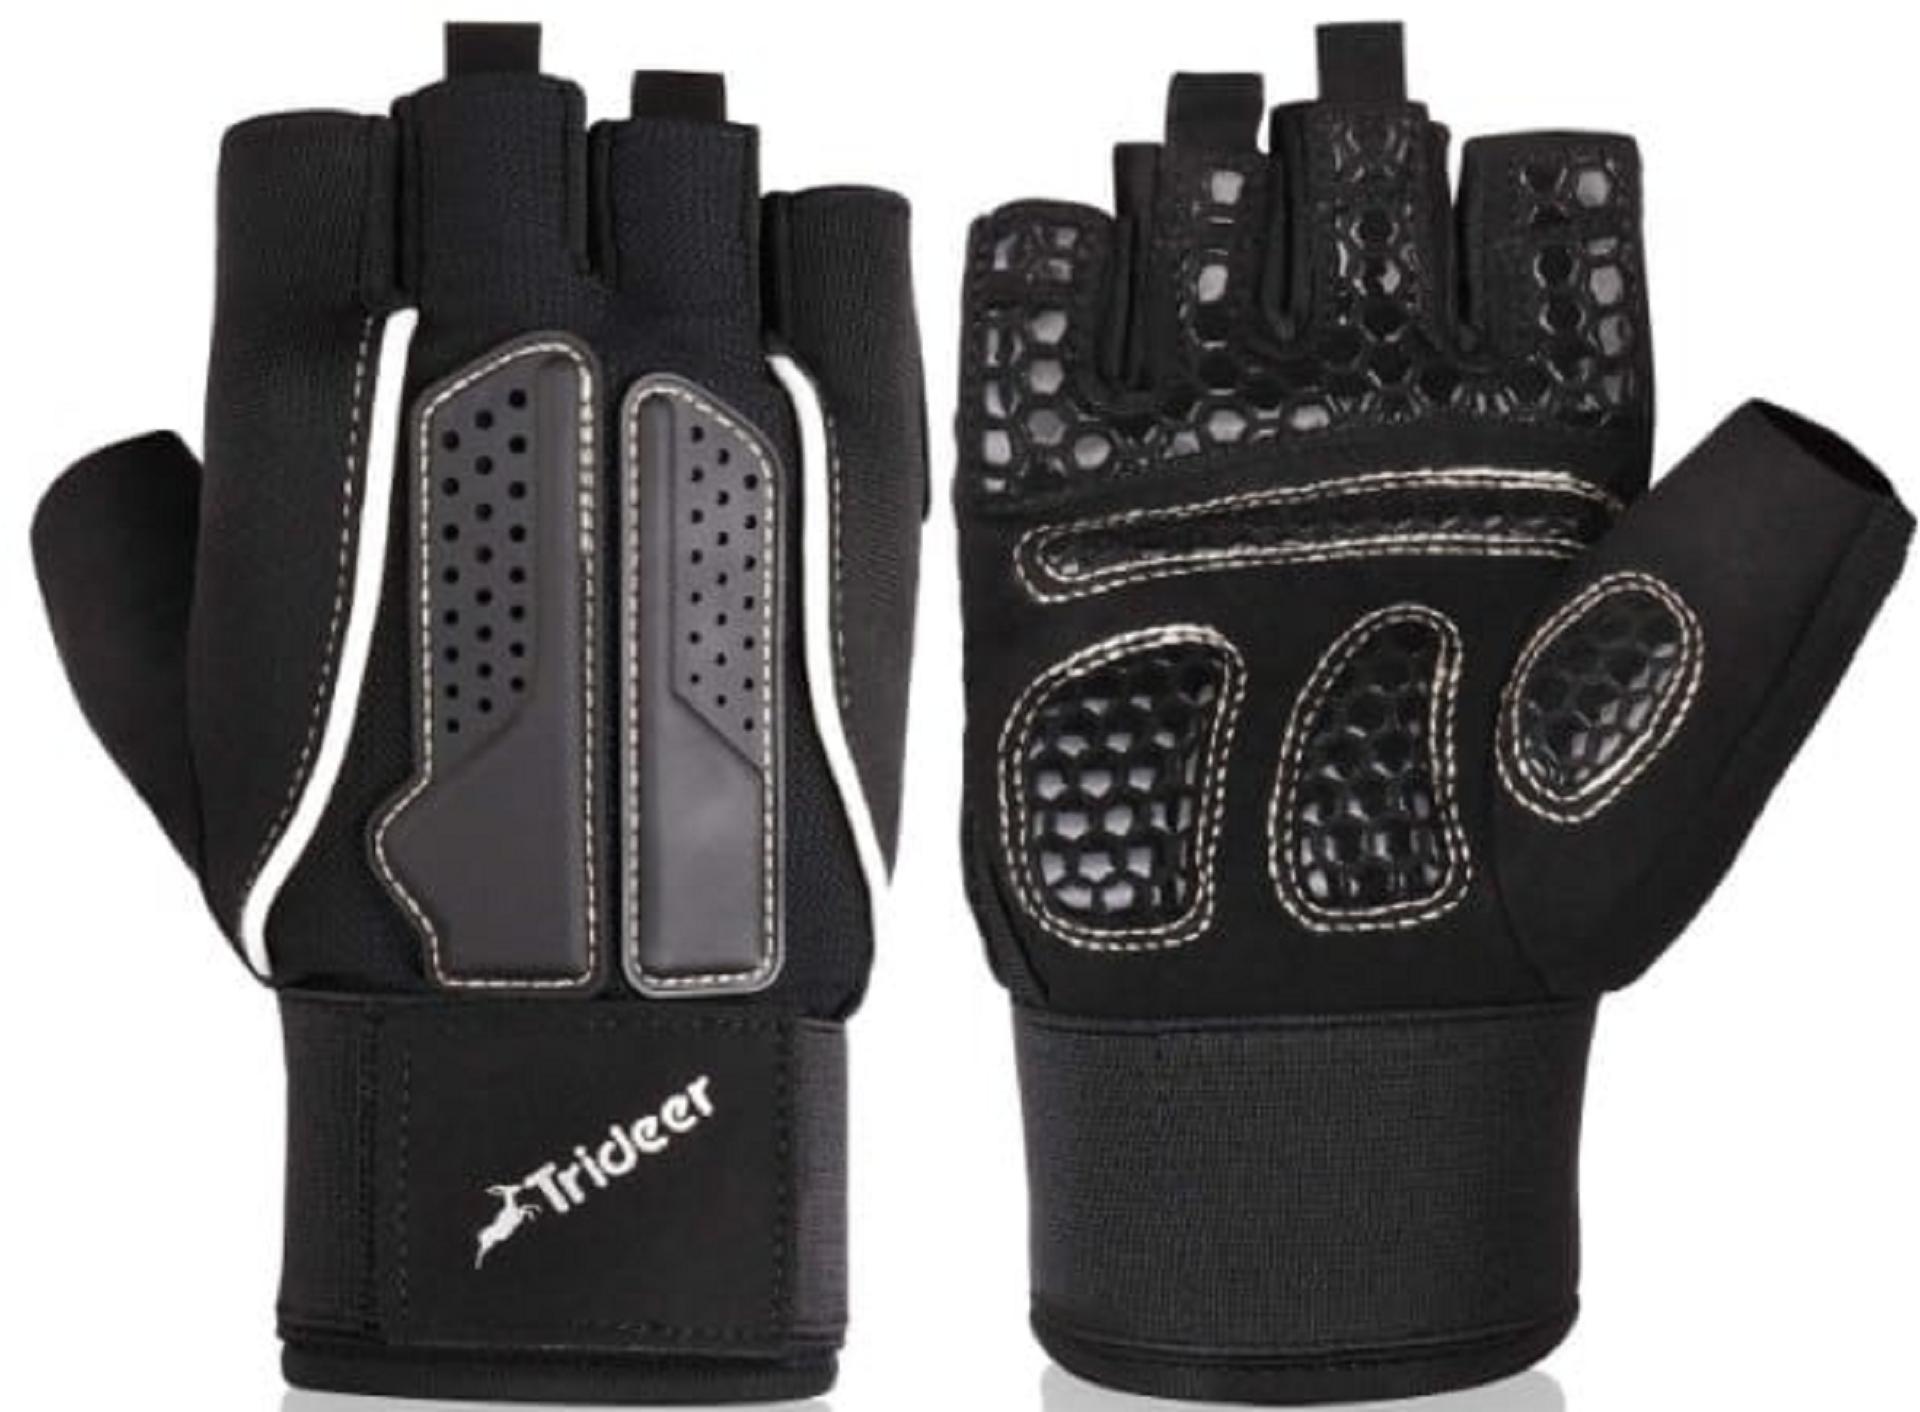 trideer half-cut weight lifting gloves